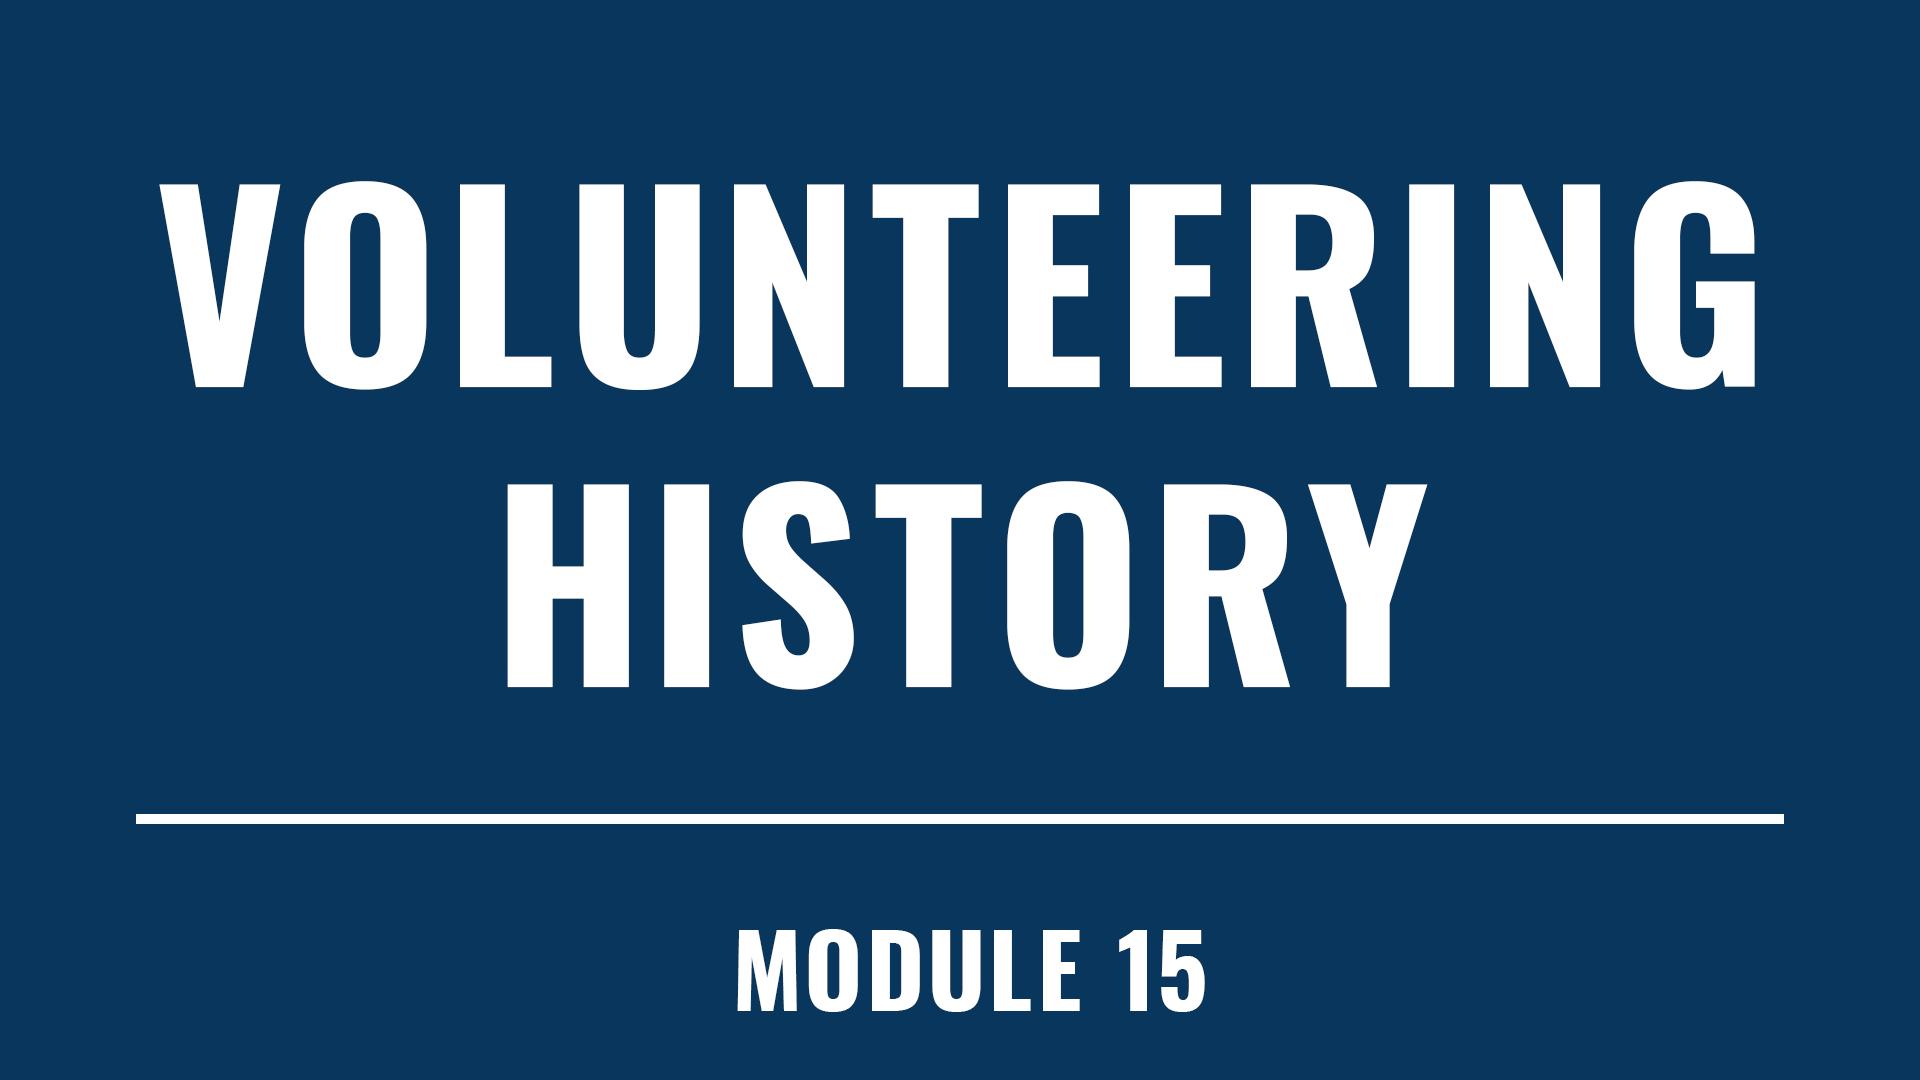 Volunteering History